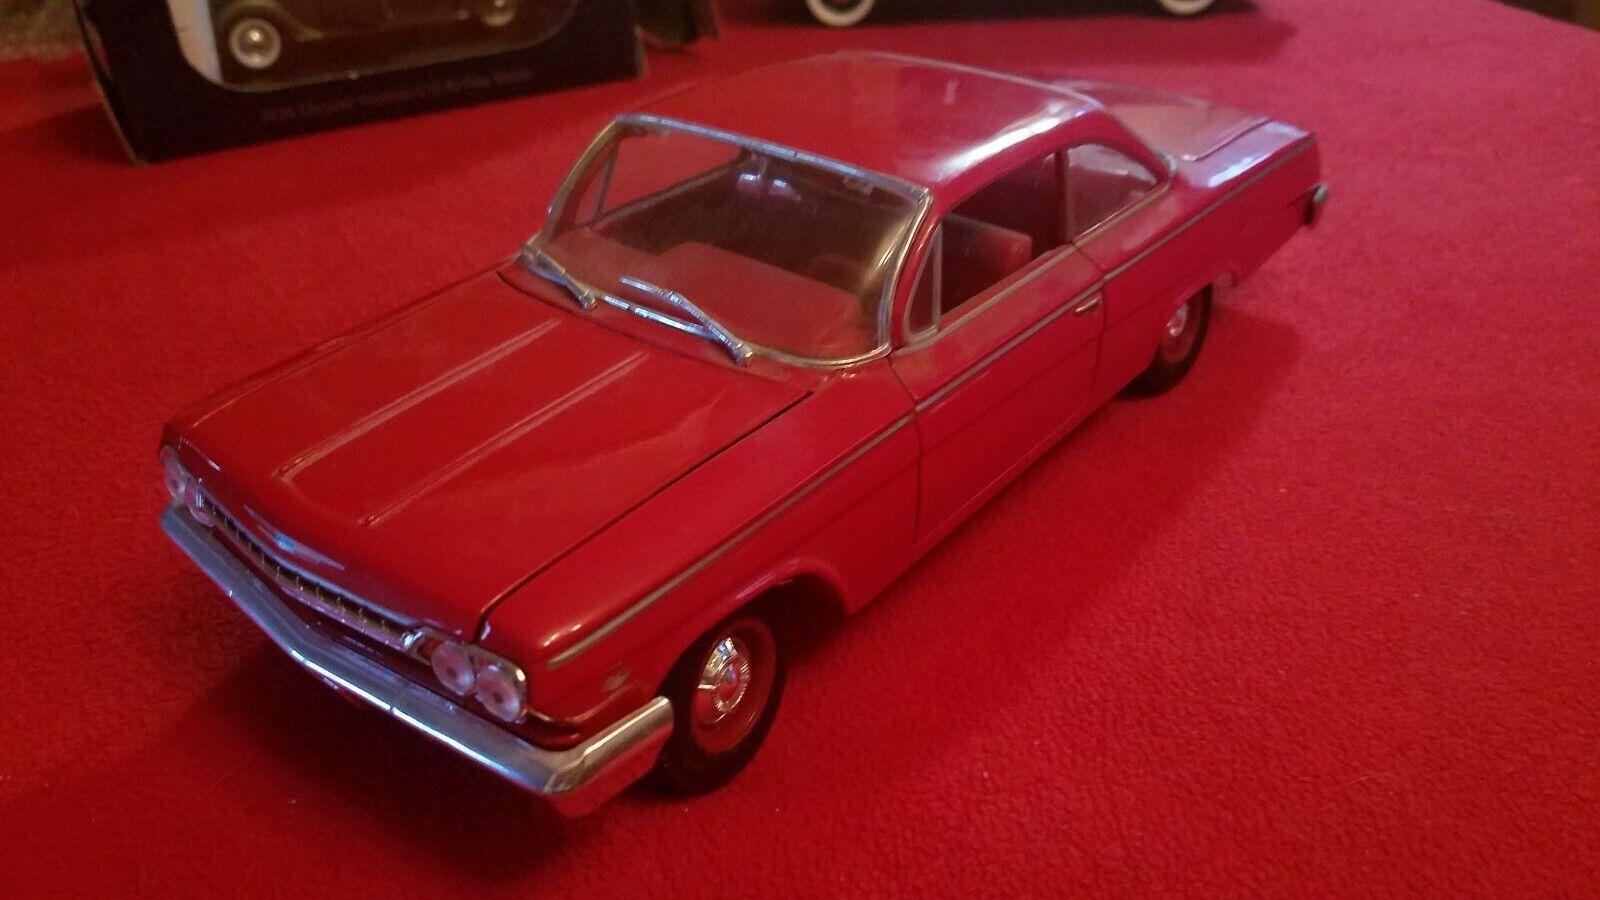 NICE   MAISTO MAISTO MAISTO DIECAST RED 1962 CHEVROLET BEL AIR 1 18 SCALE   8f7c5b